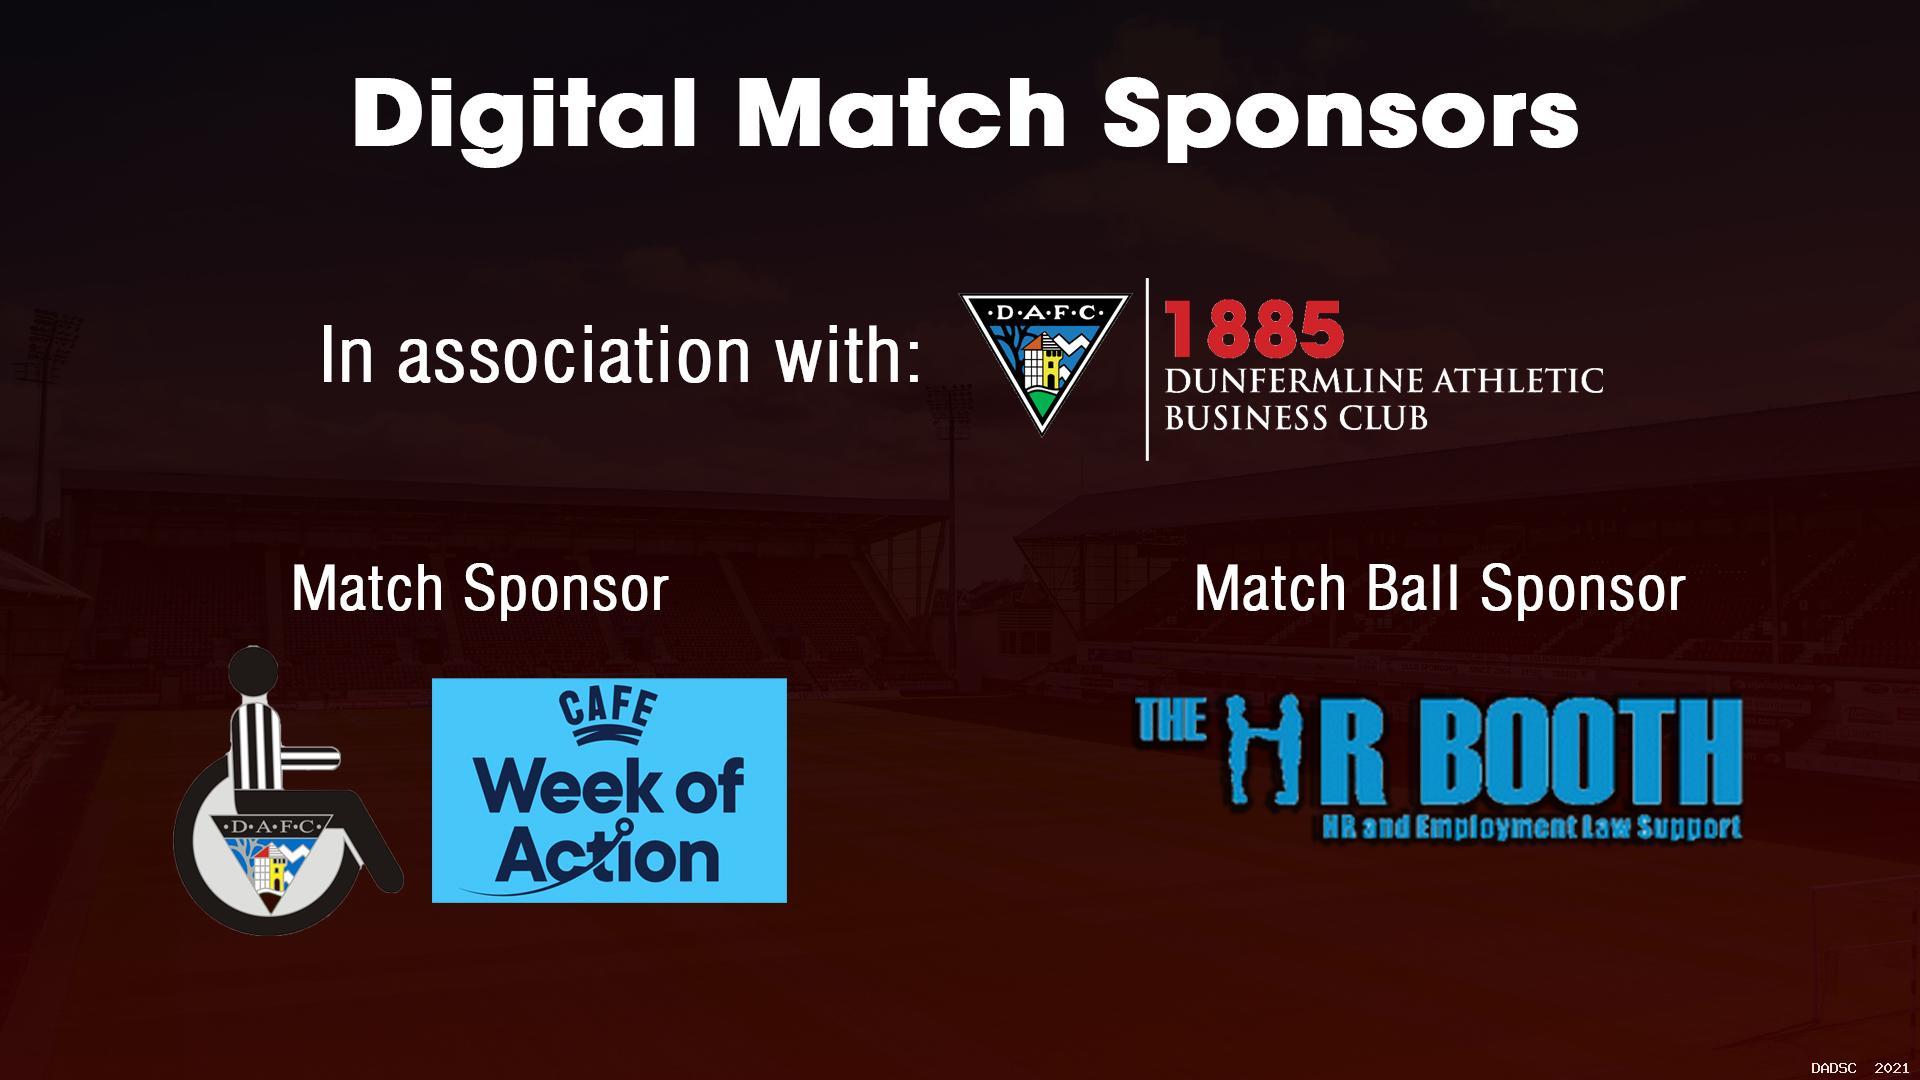 DADSC & CAFE Sponsor DAFC Match